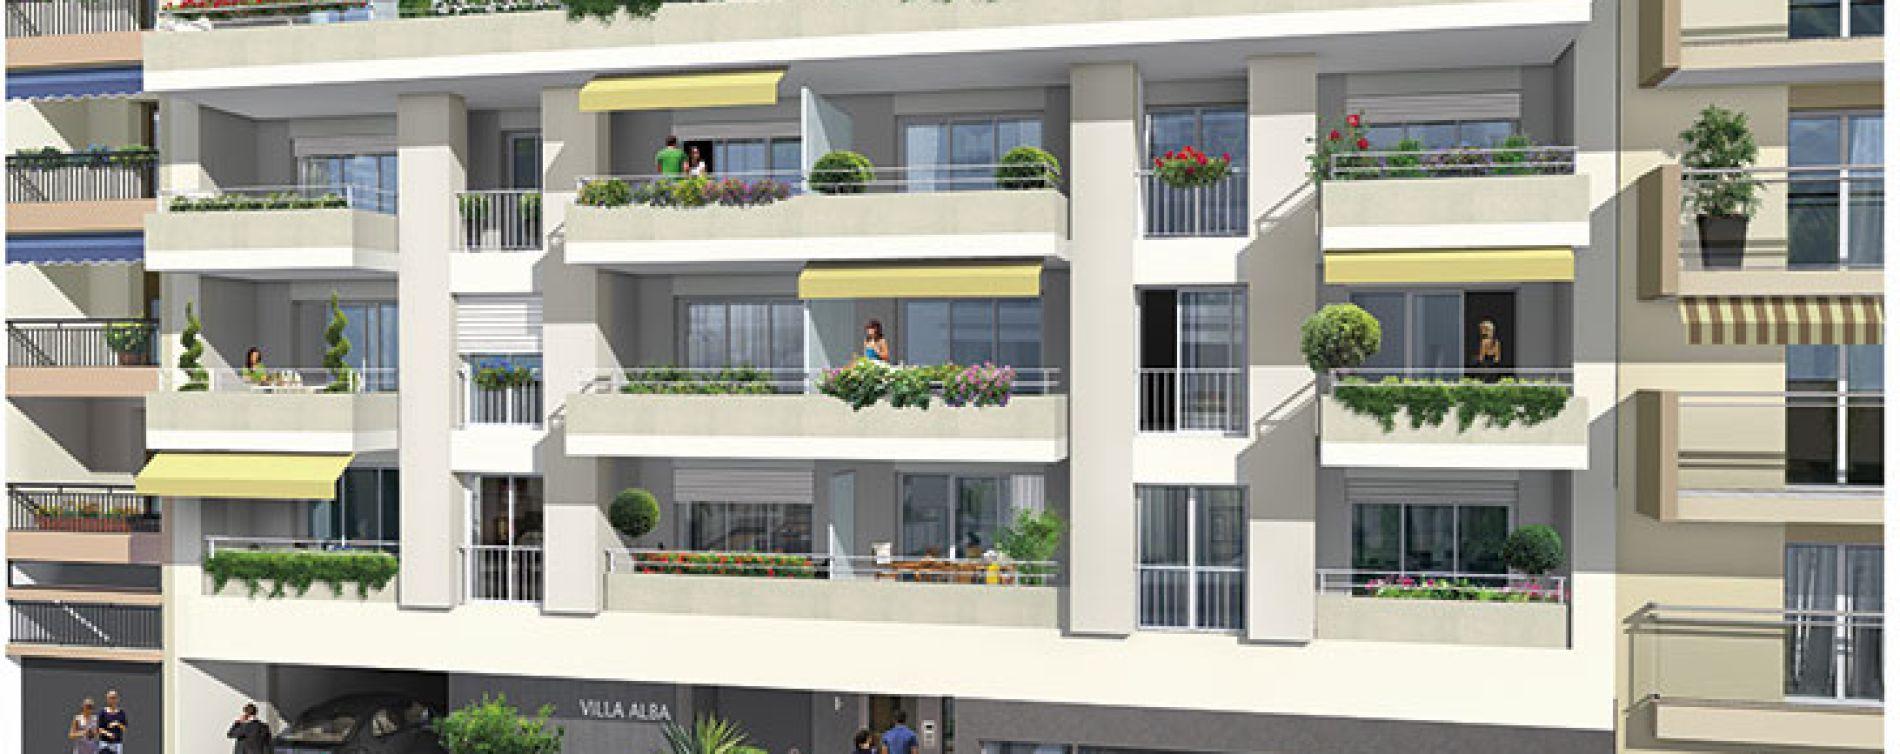 Résidence Villa Alba à Antibes